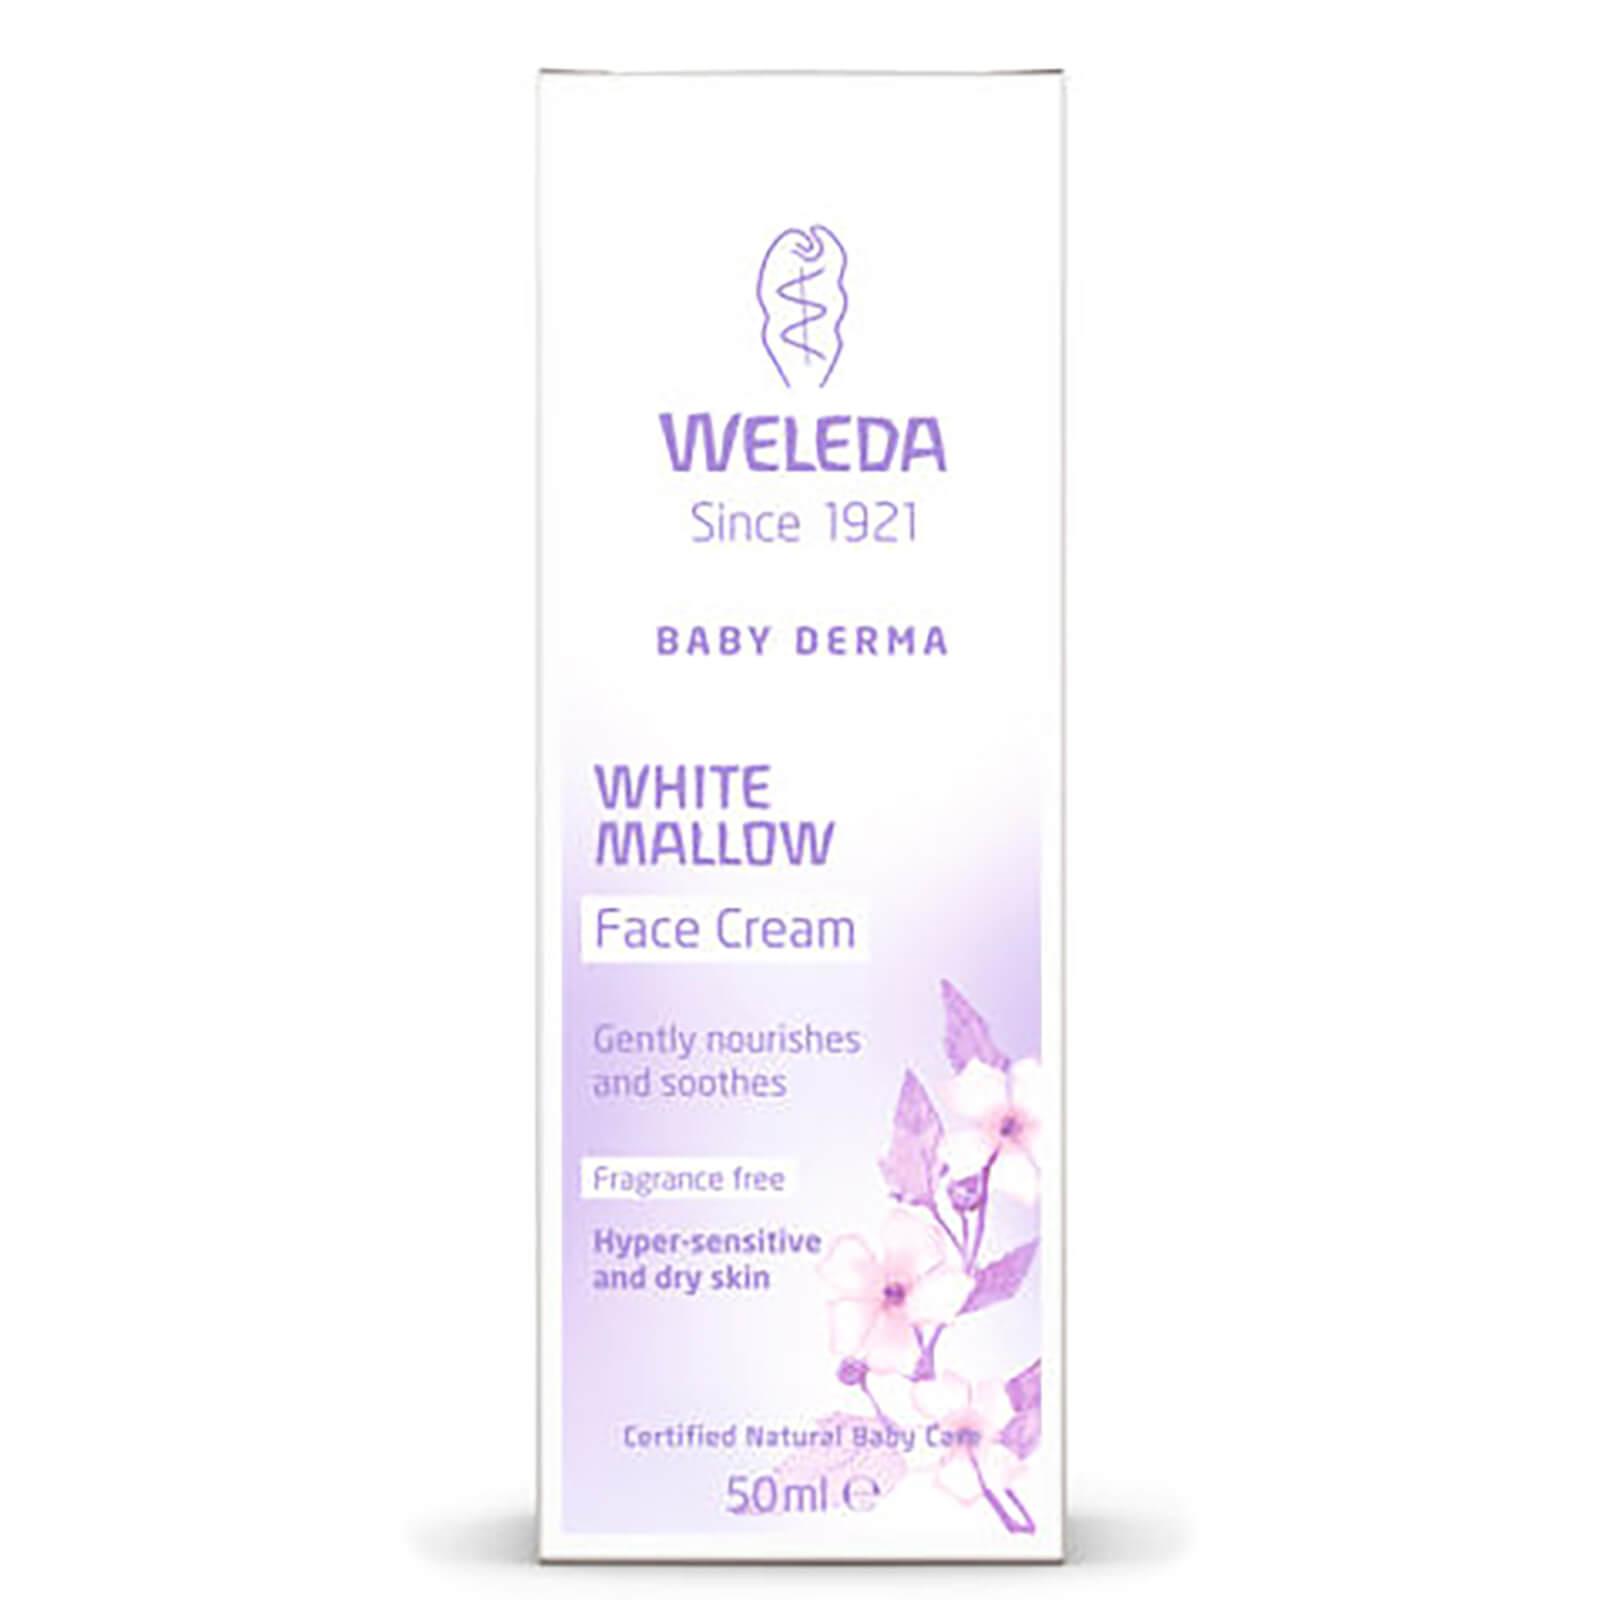 Weleda Crème pour le visage Weleda Baby Derma White Mallow Face Cream (50 ml)